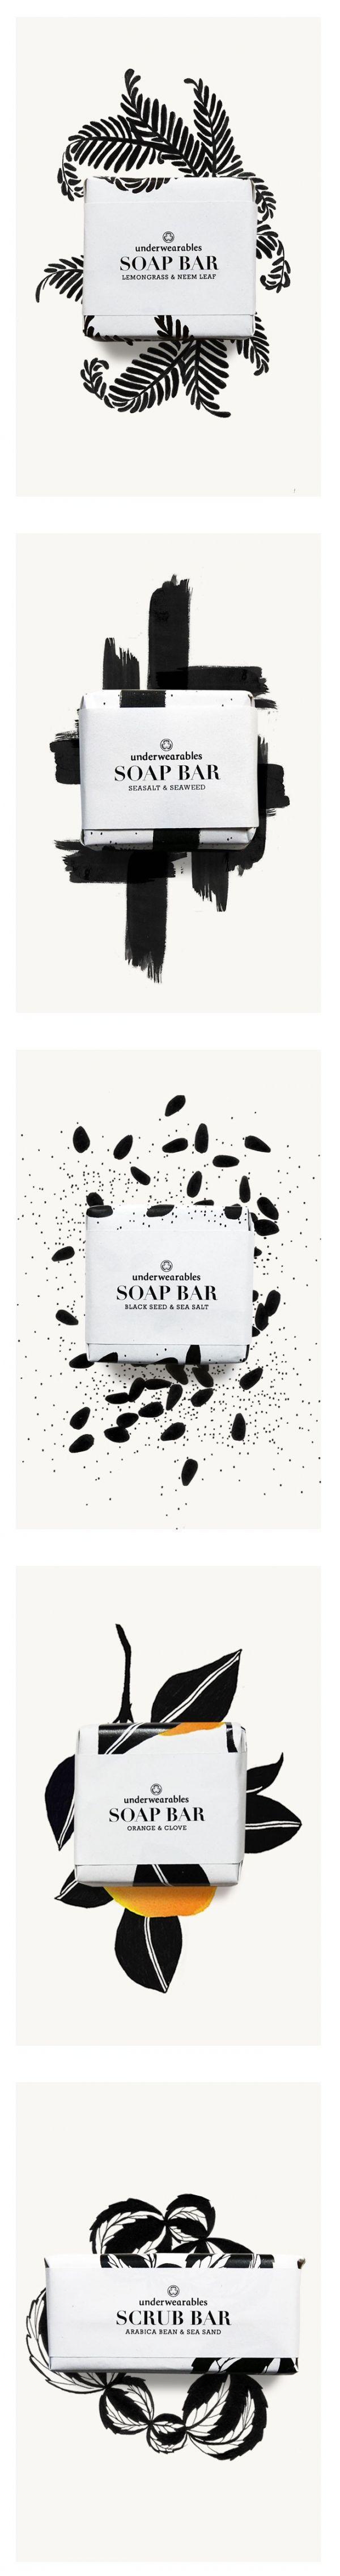 underwearables SOAP BAR #packaging